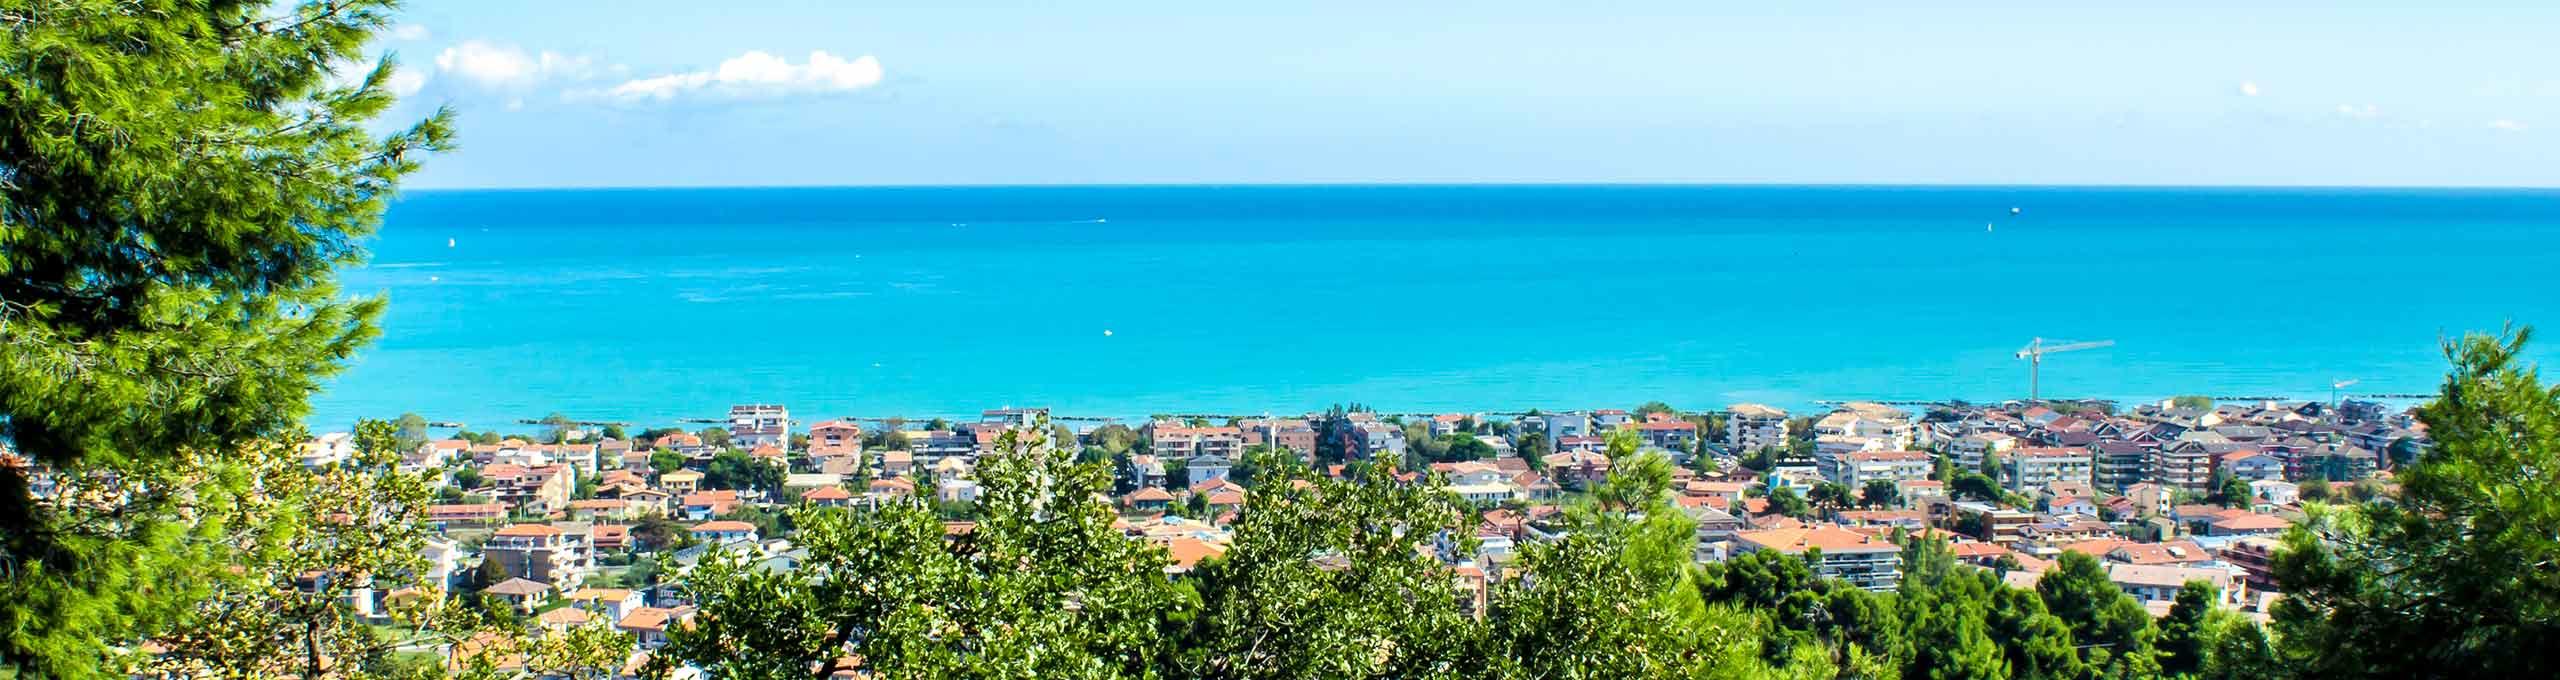 Panoramica su Pescara